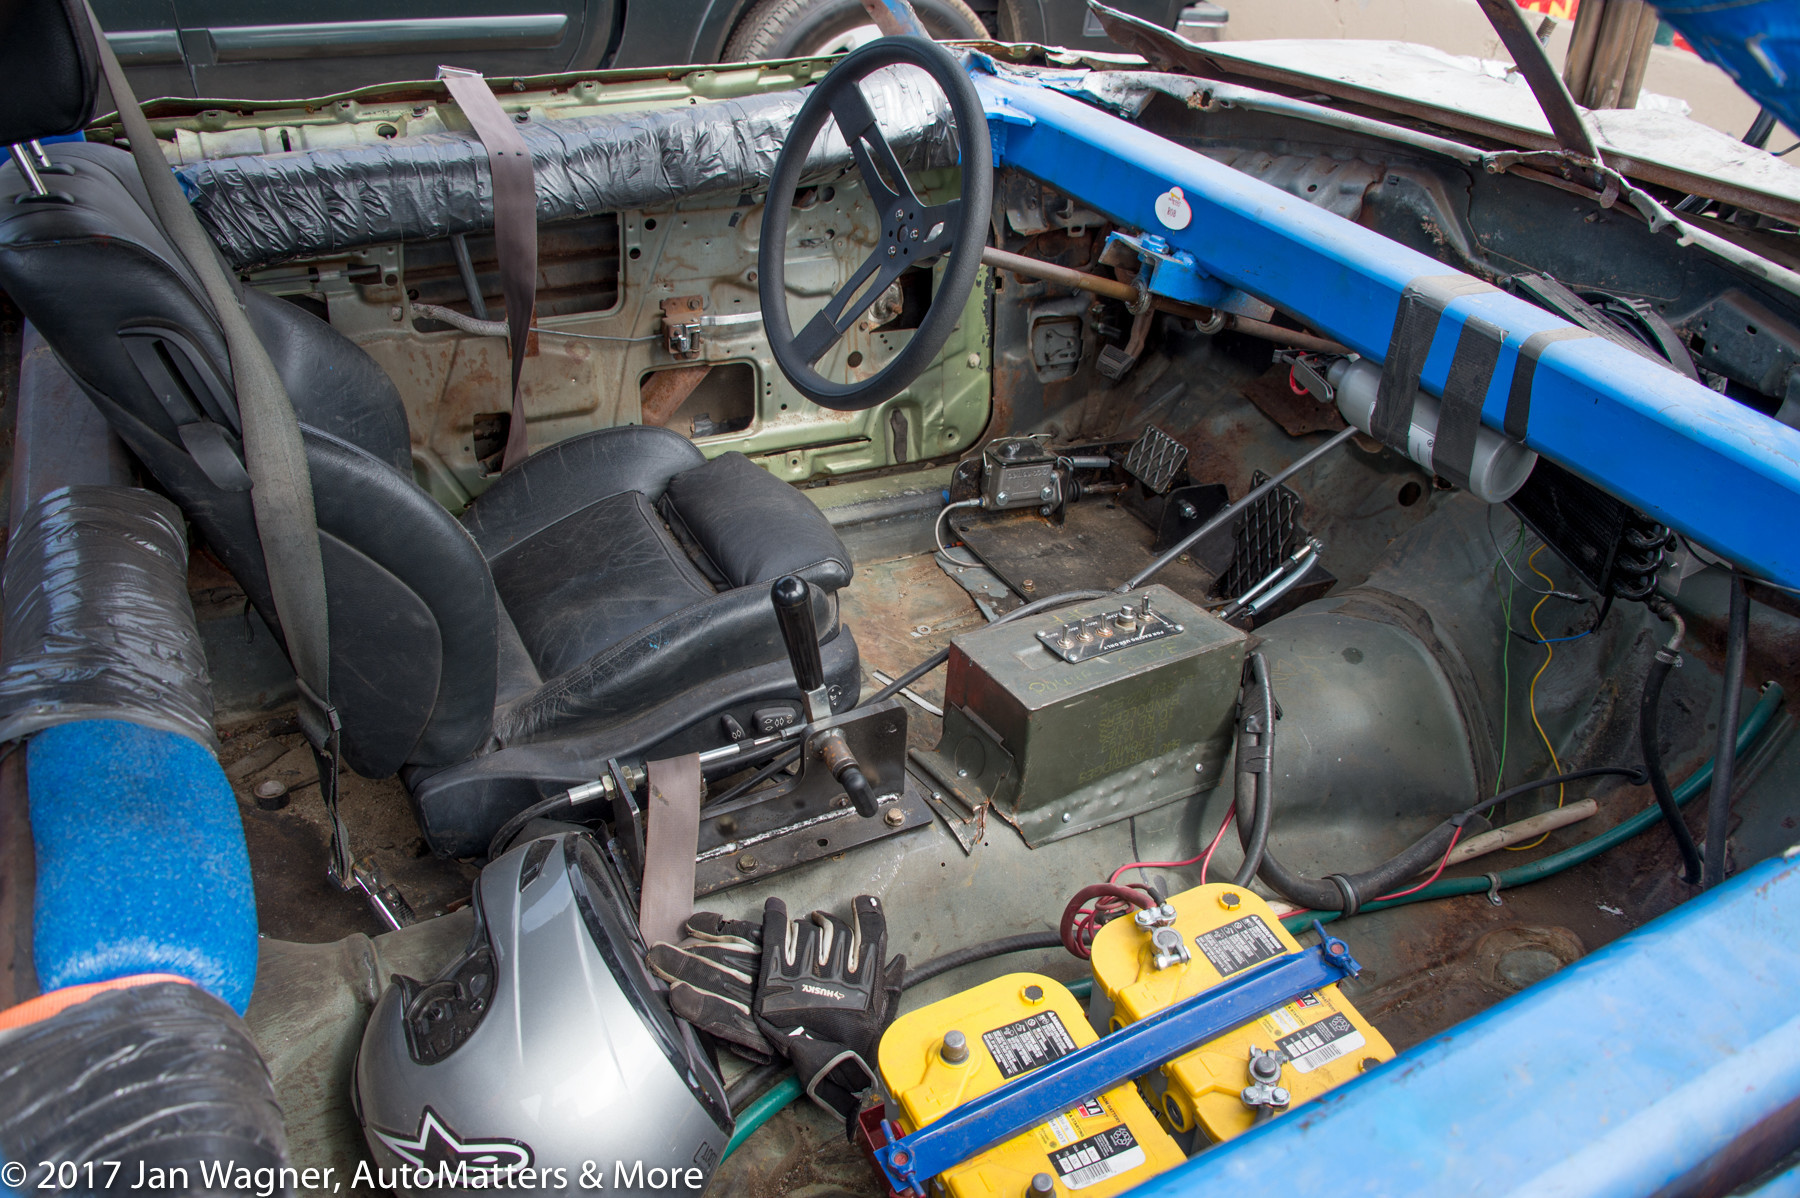 Interior of Robert Hernandez' 1972 Chevy Impala